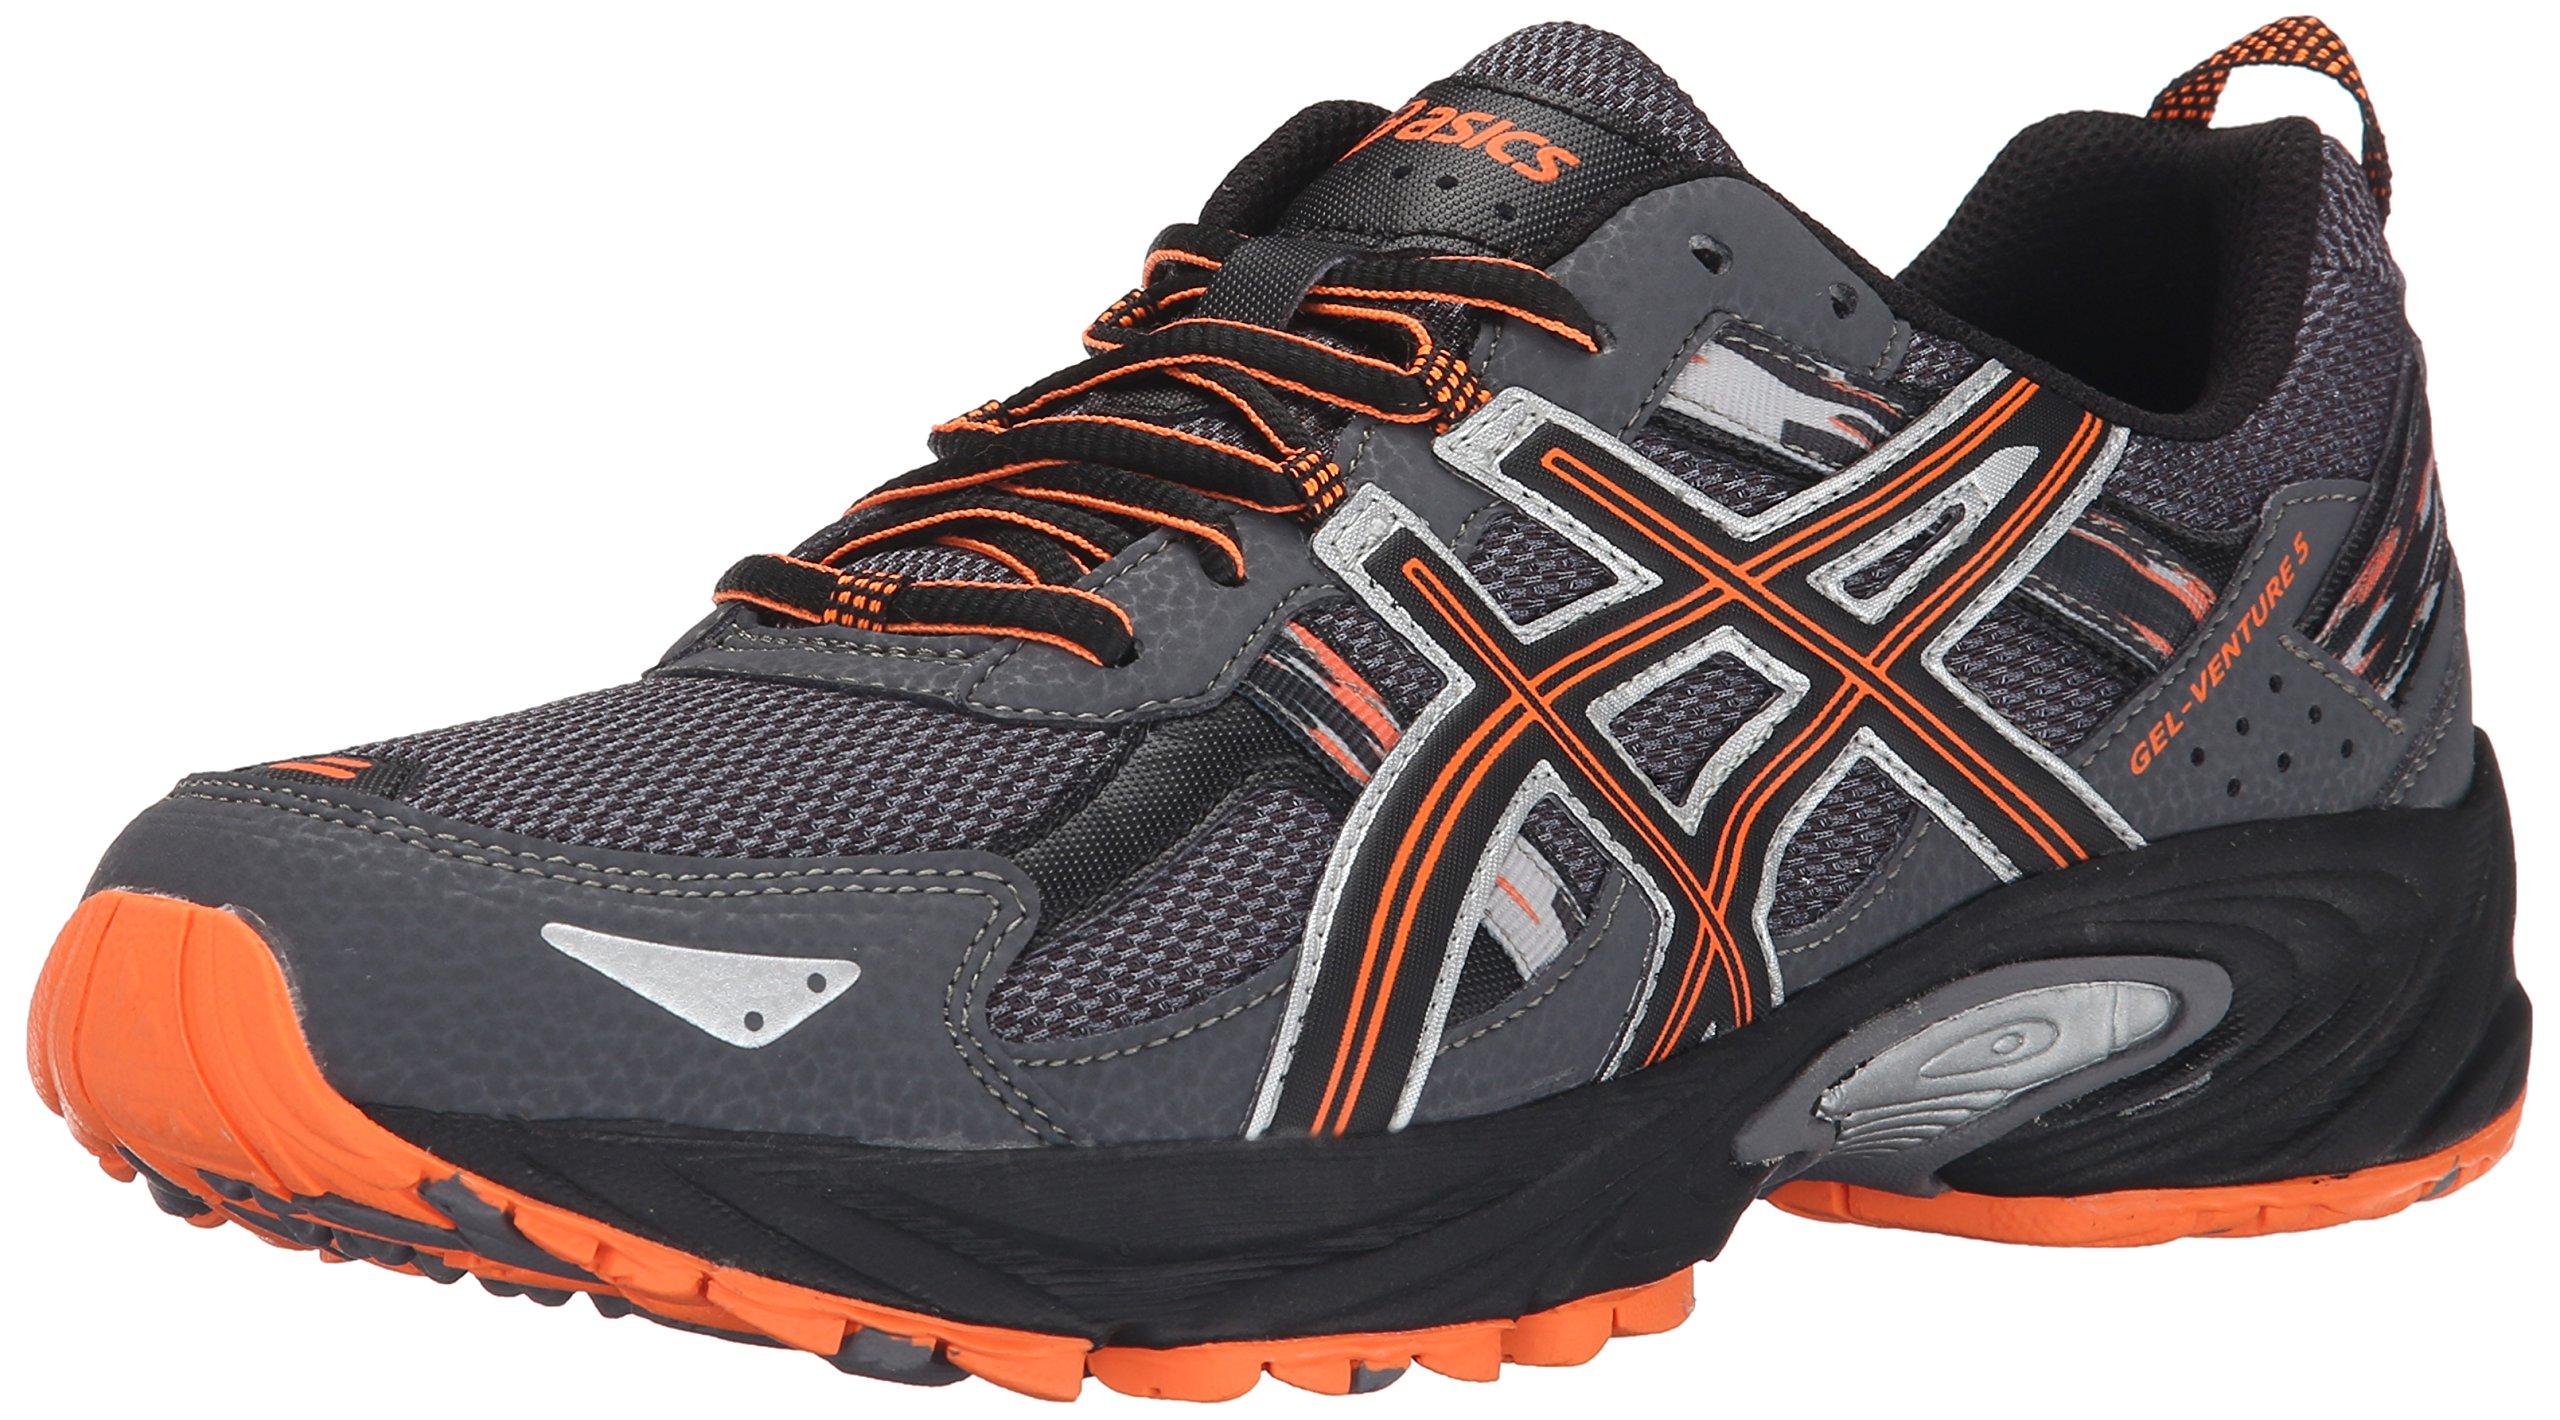 ASICS Men's Gel-Venture 5-M, Carbon/Black/Hot Orange 7.5 M US by ASICS (Image #1)